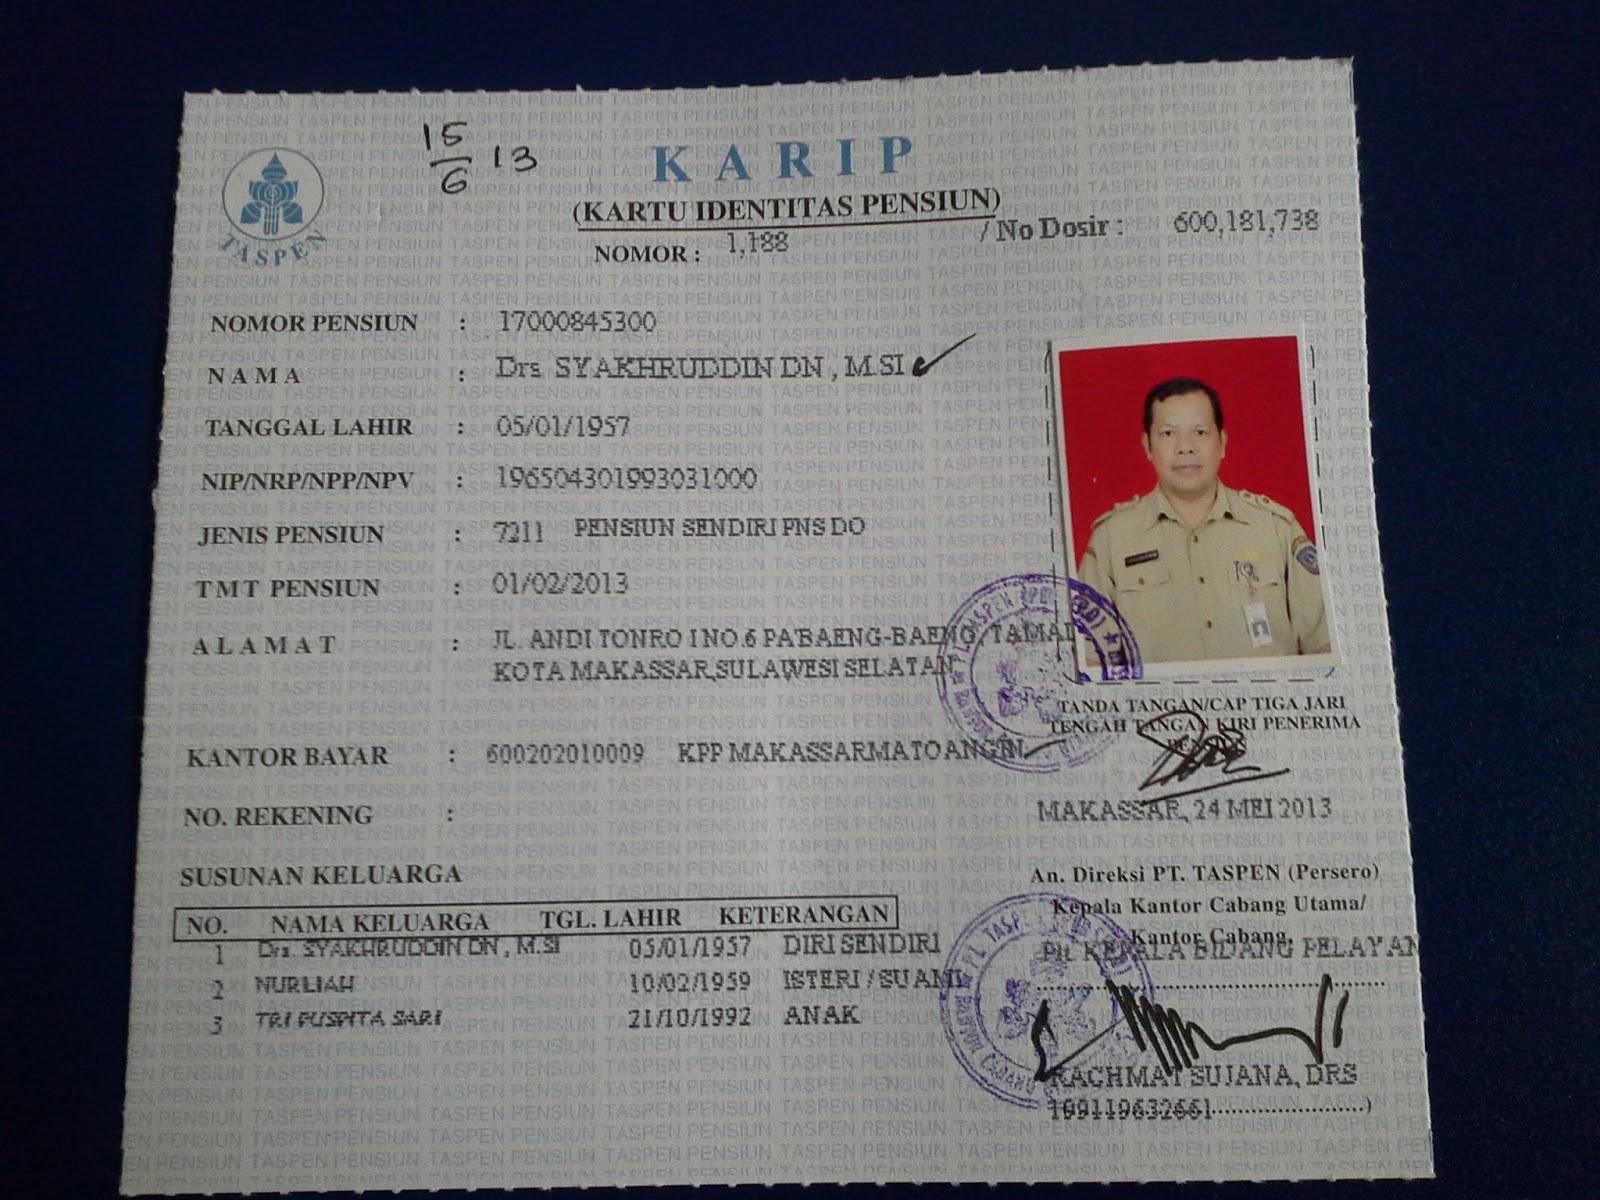 Karip Sudah Tiba Syakhruddincom